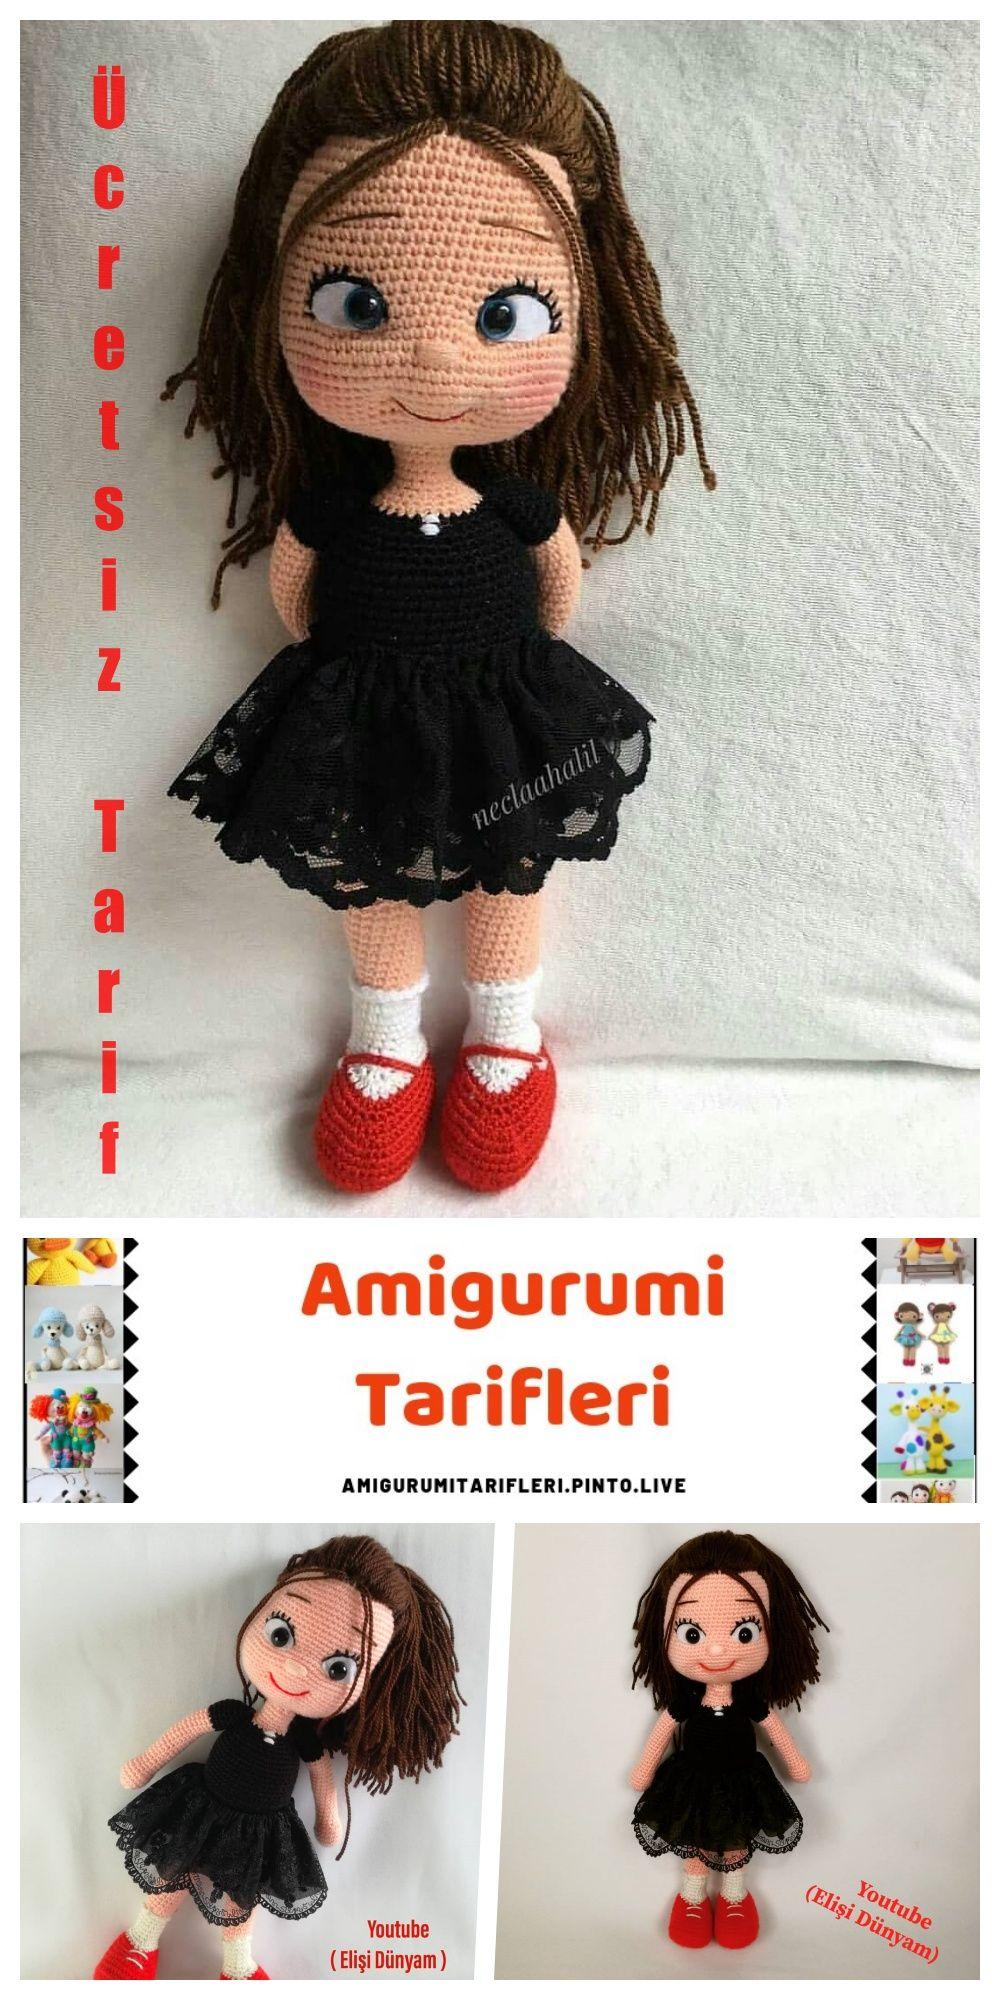 Amigurumi Fare Yapımı - Amigurumi Tariflerim - Amigurumi Ücretsiz ... | 2000x1000